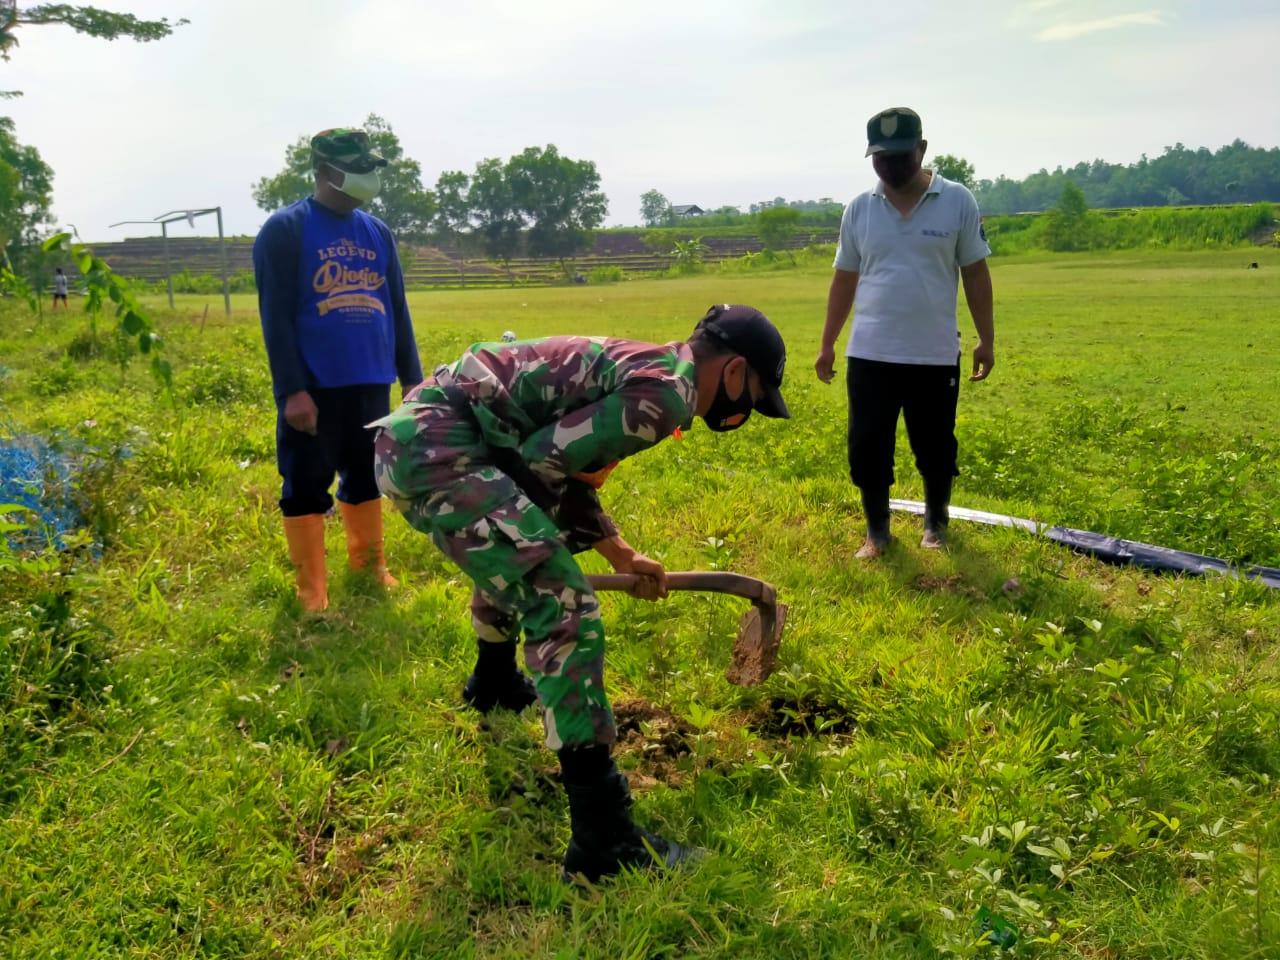 INDES-HANKAM TNI MOBILISIR MASYARAKAT BOYOLALI HIJAUKAN LAHAN KOSONG 01